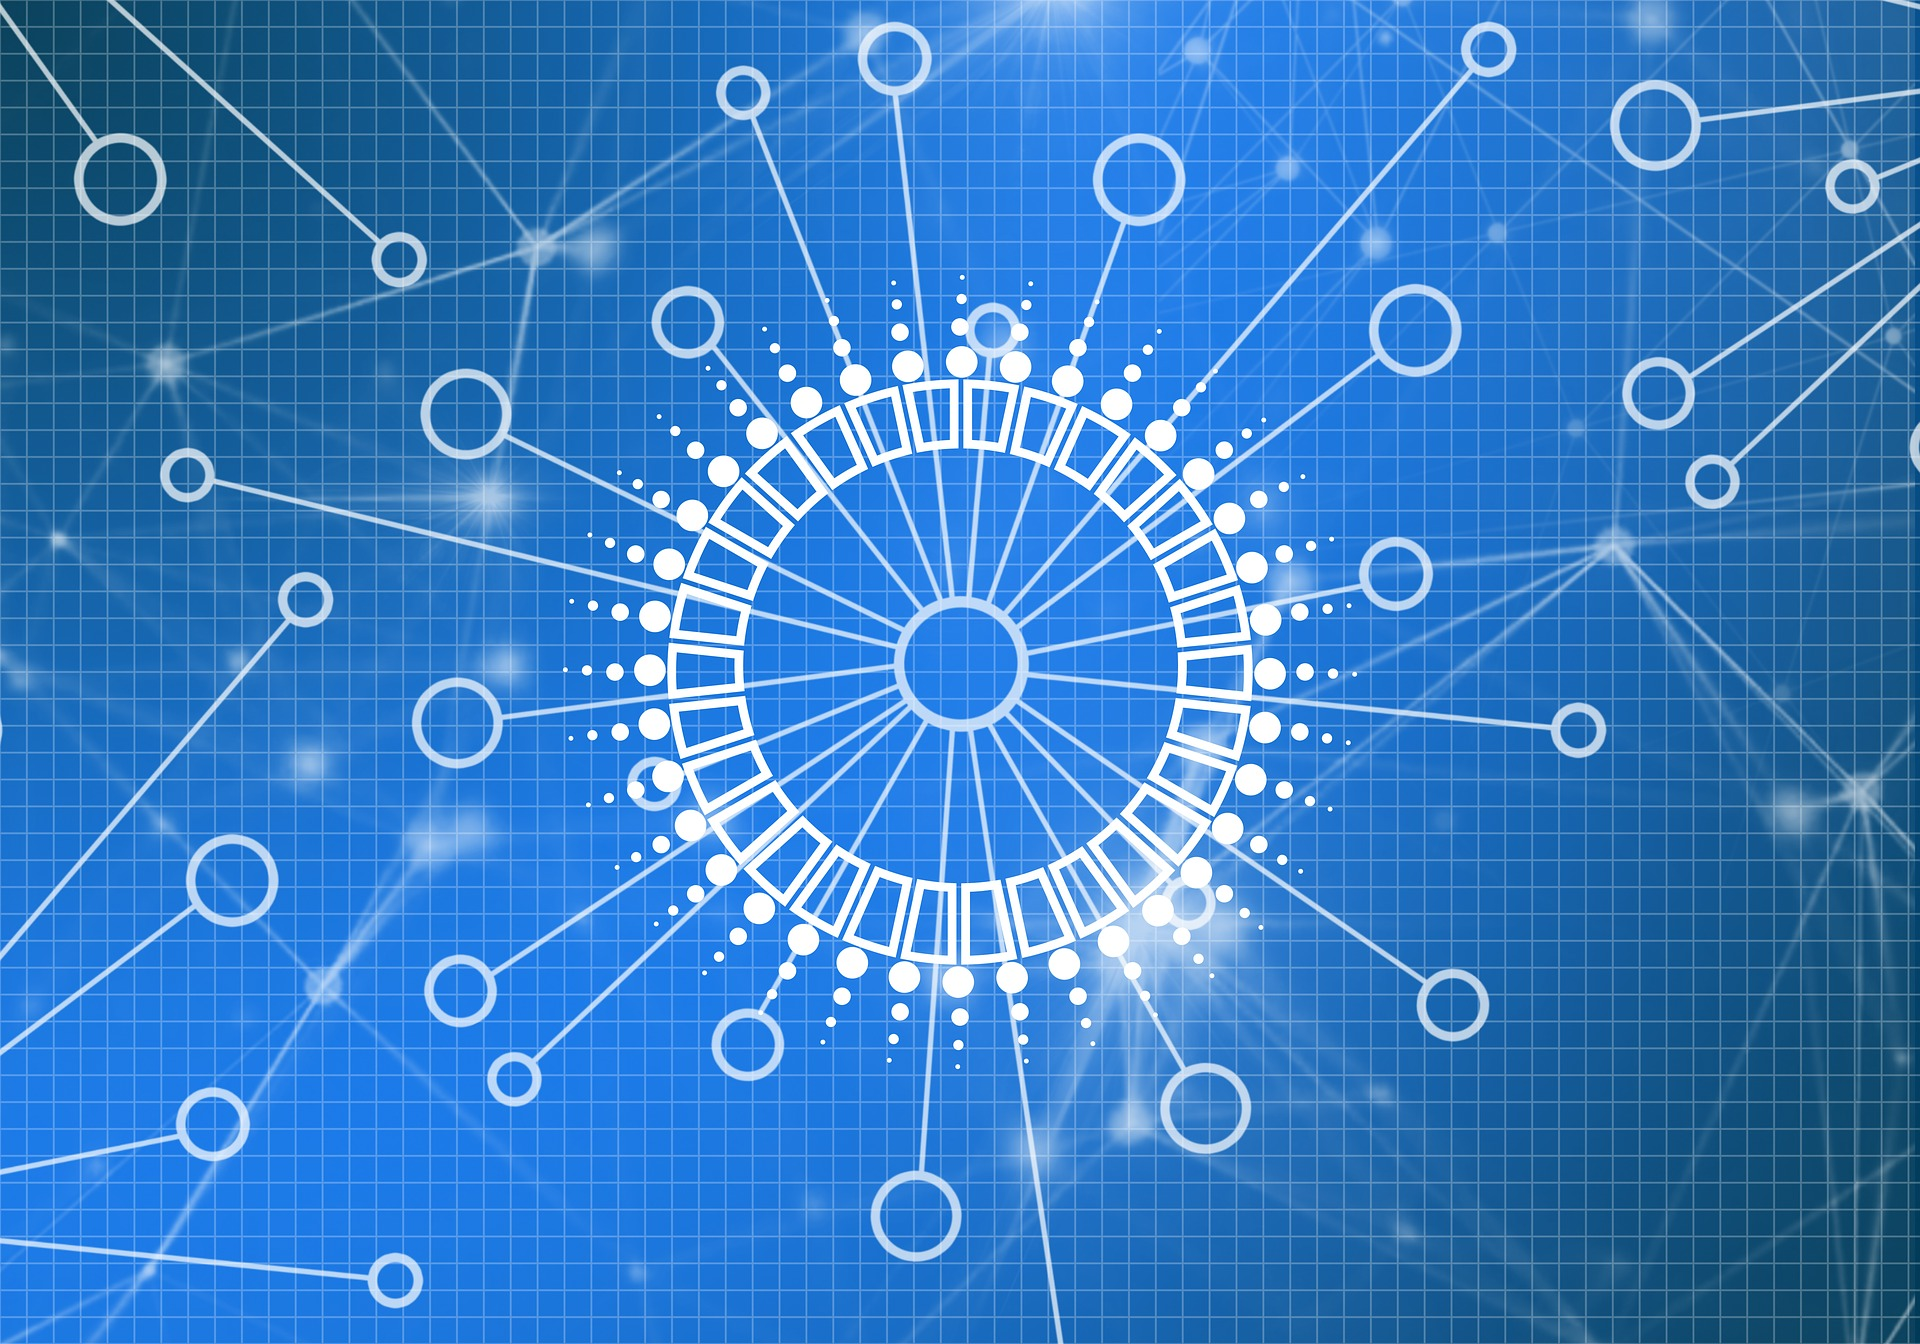 BTA Releases Groundbreaking Blueprint for Blockchain and Social Innovation